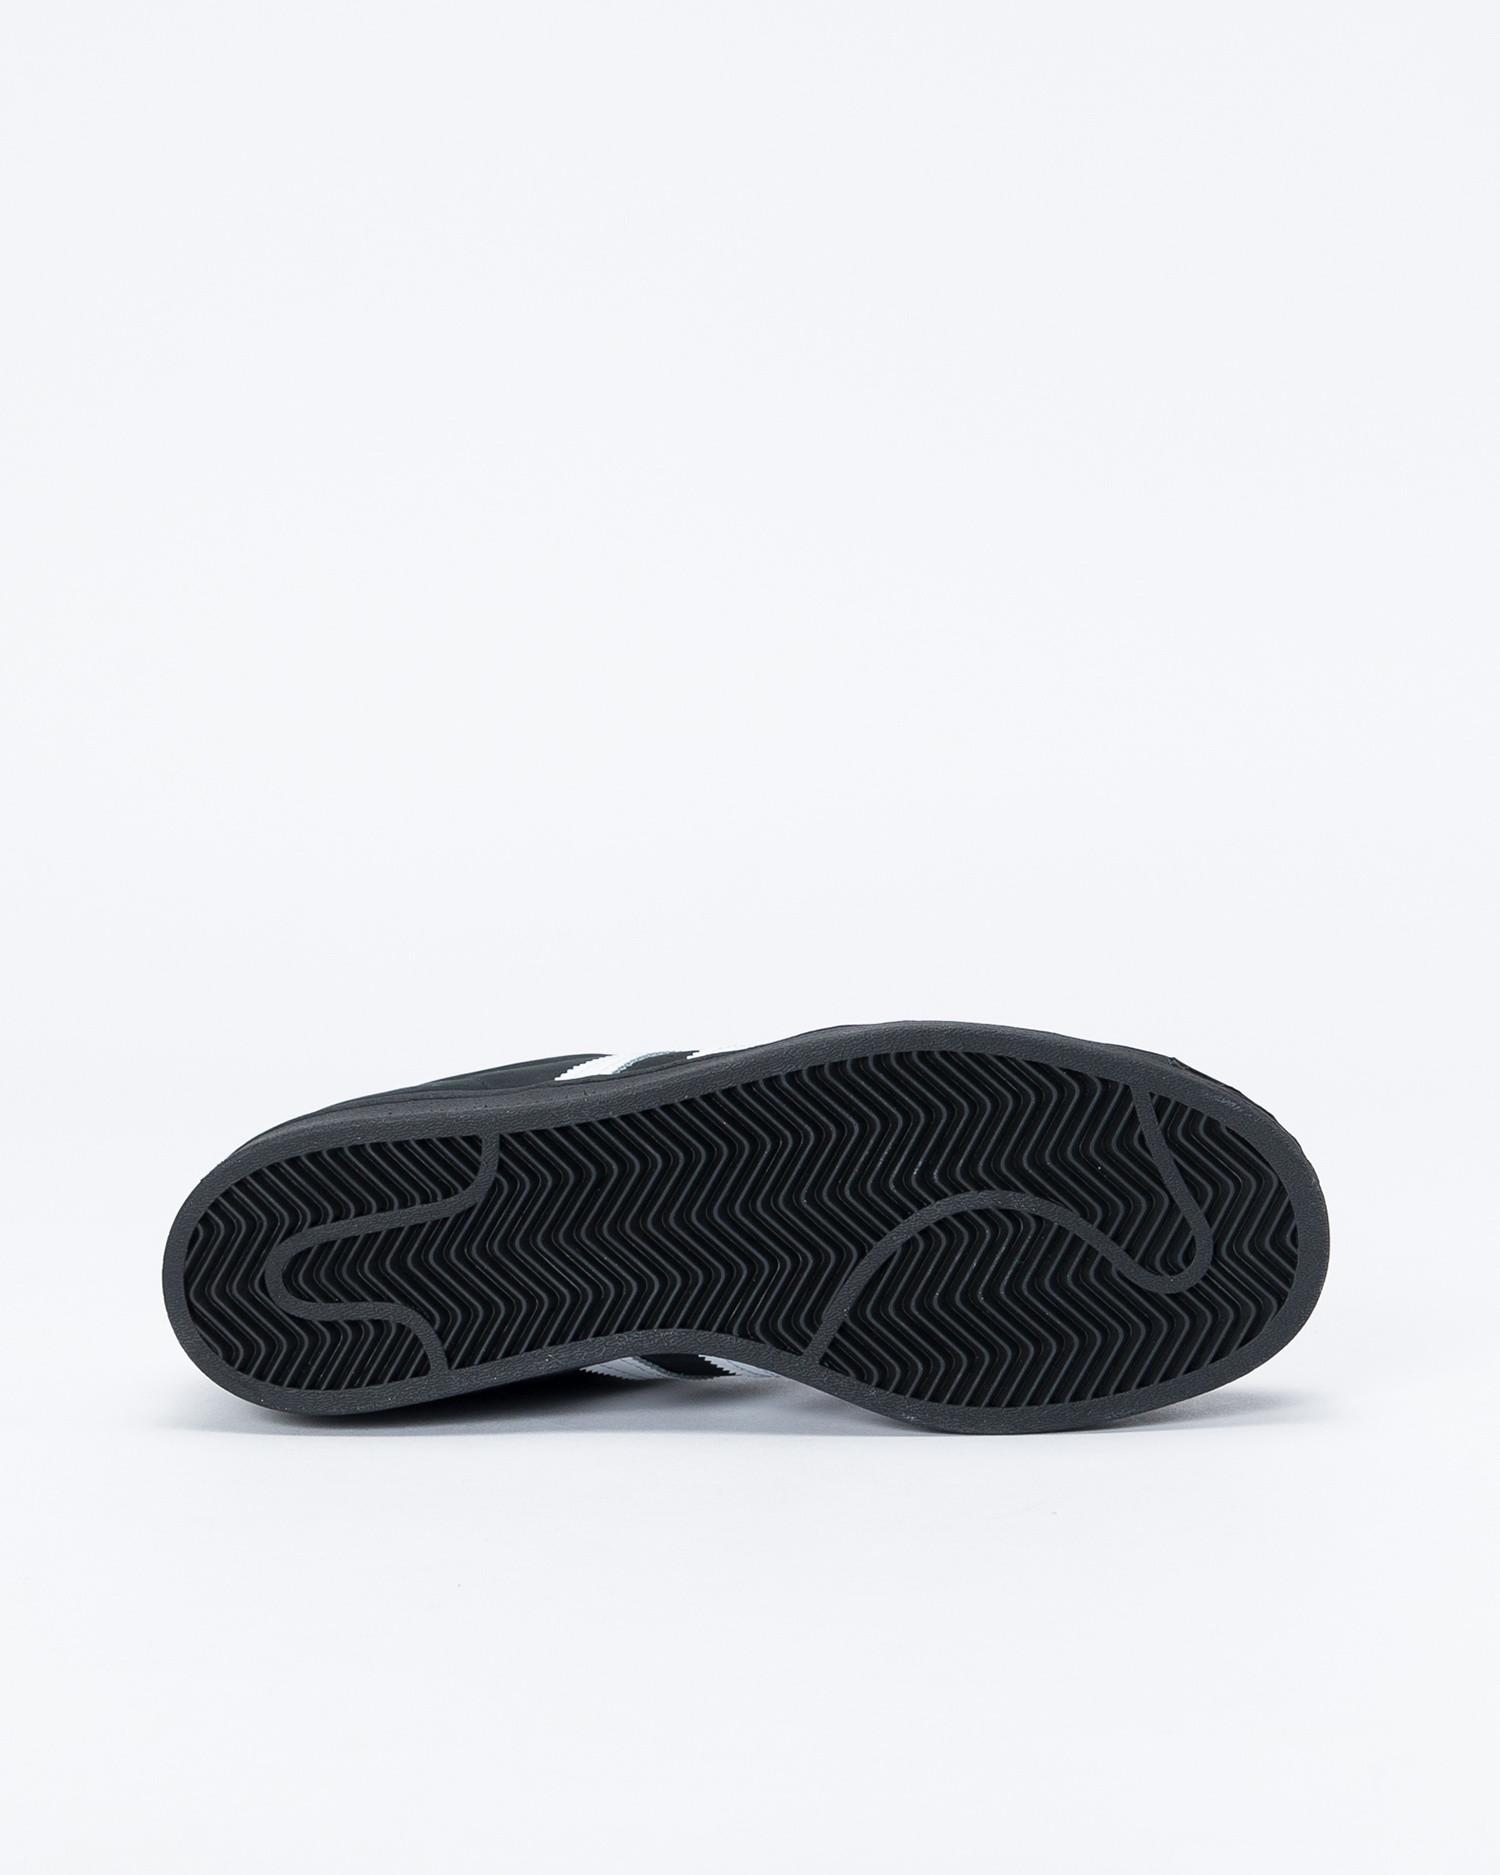 Adidas Superstar ADV Core Black/Footwear White/Gold Metallic